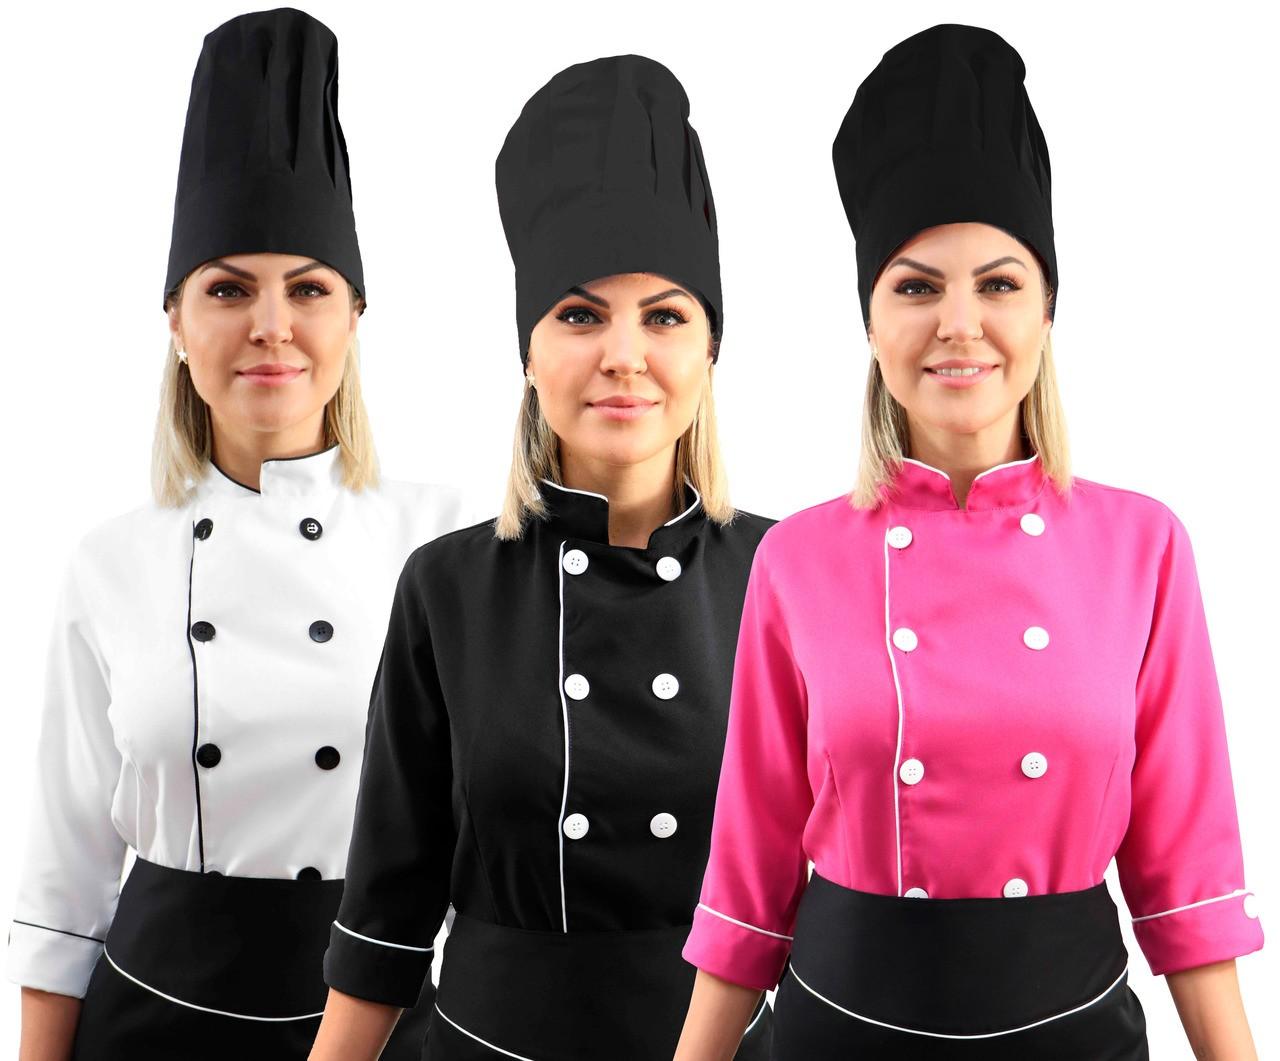 Kit chef cozinha feminino Dolmã manga 3/4 + Avental preto + Chapéu preto